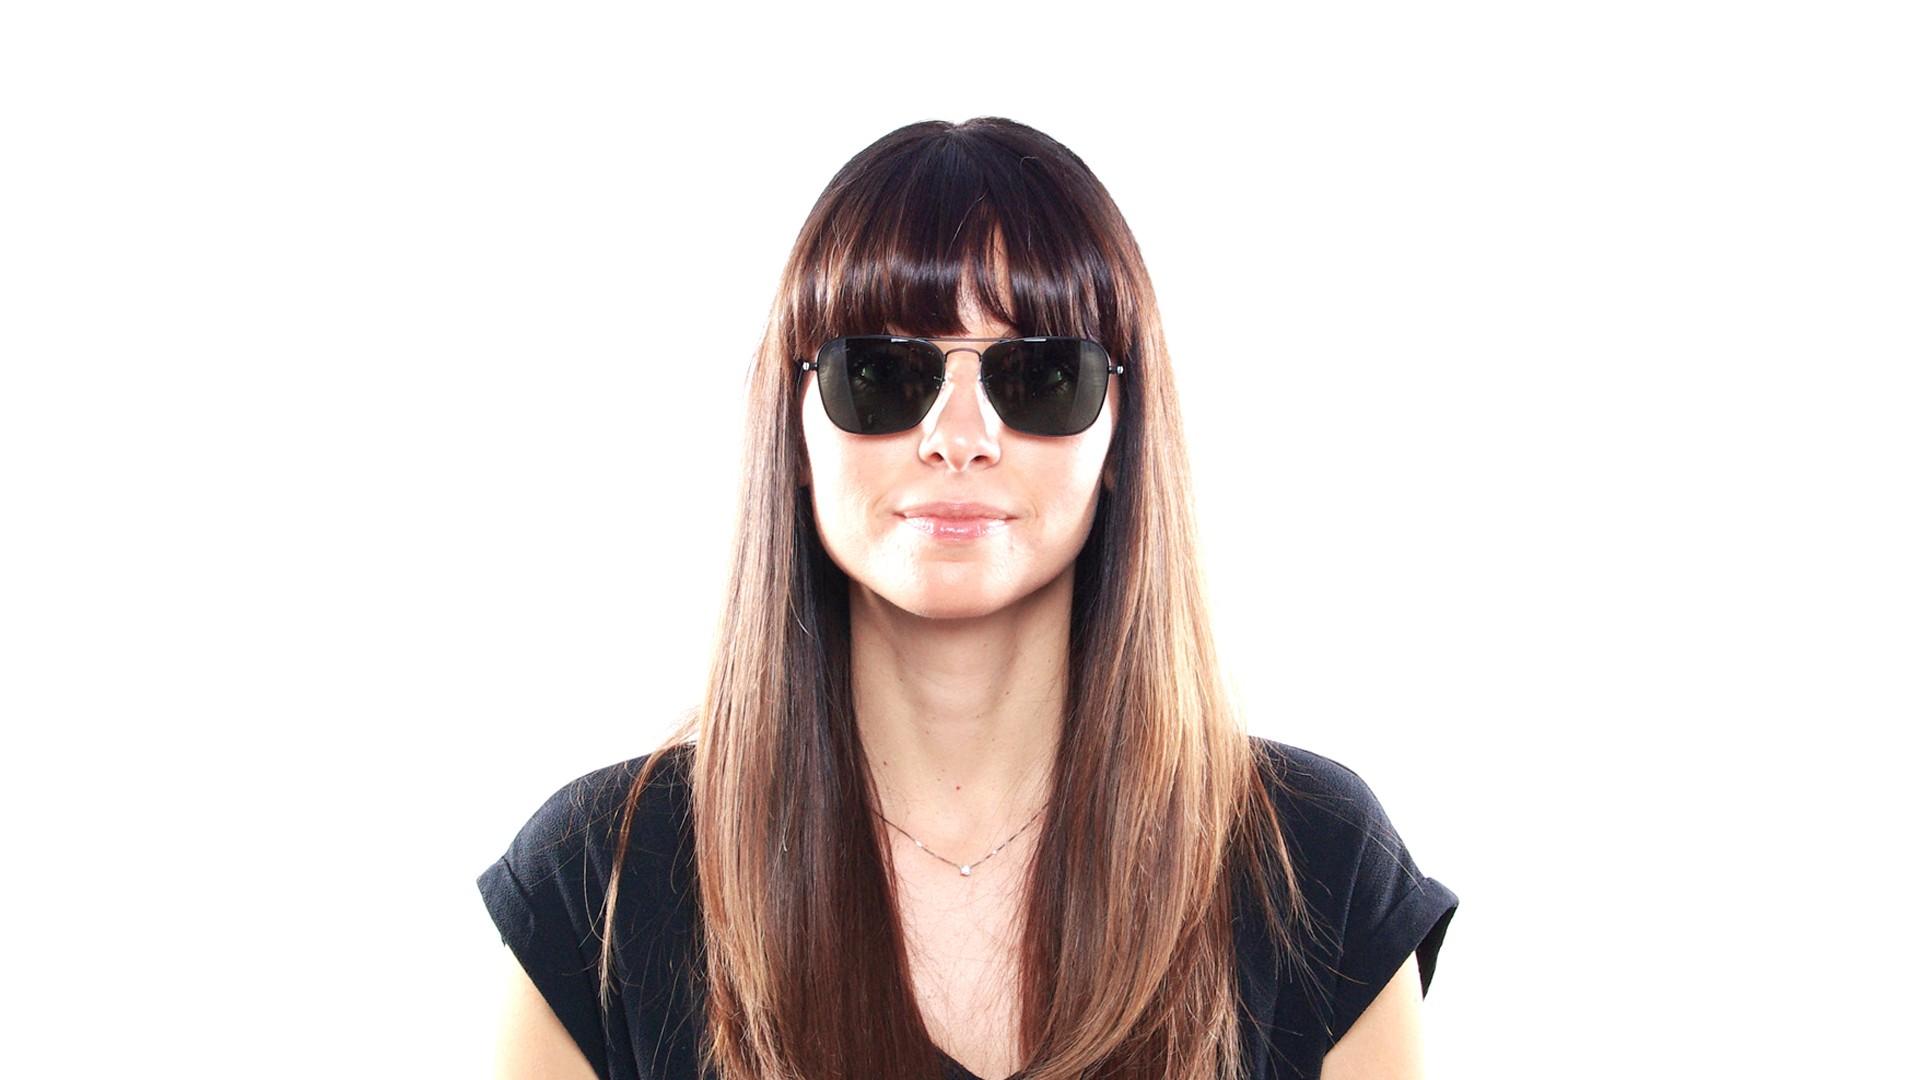 23555e2f539 Sunglasses Ray-Ban Caravan Black Matte G-15 RB3136 W3338 55-15 Medium